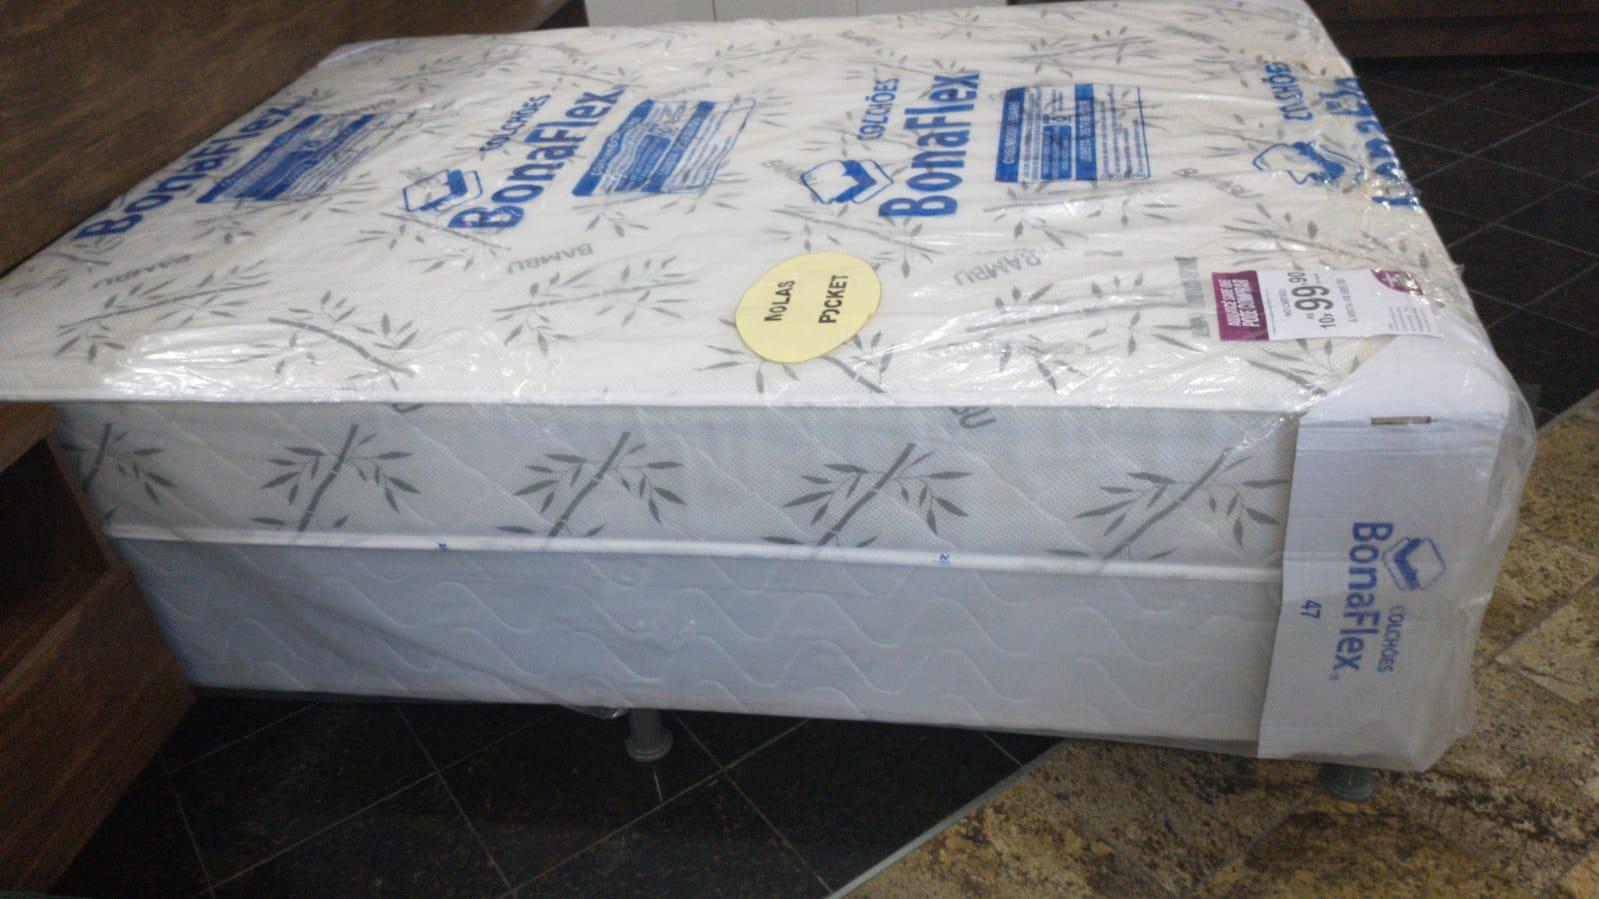 COLCHOBOX BONAFLEX GARDENIA CASAL POCKET 138